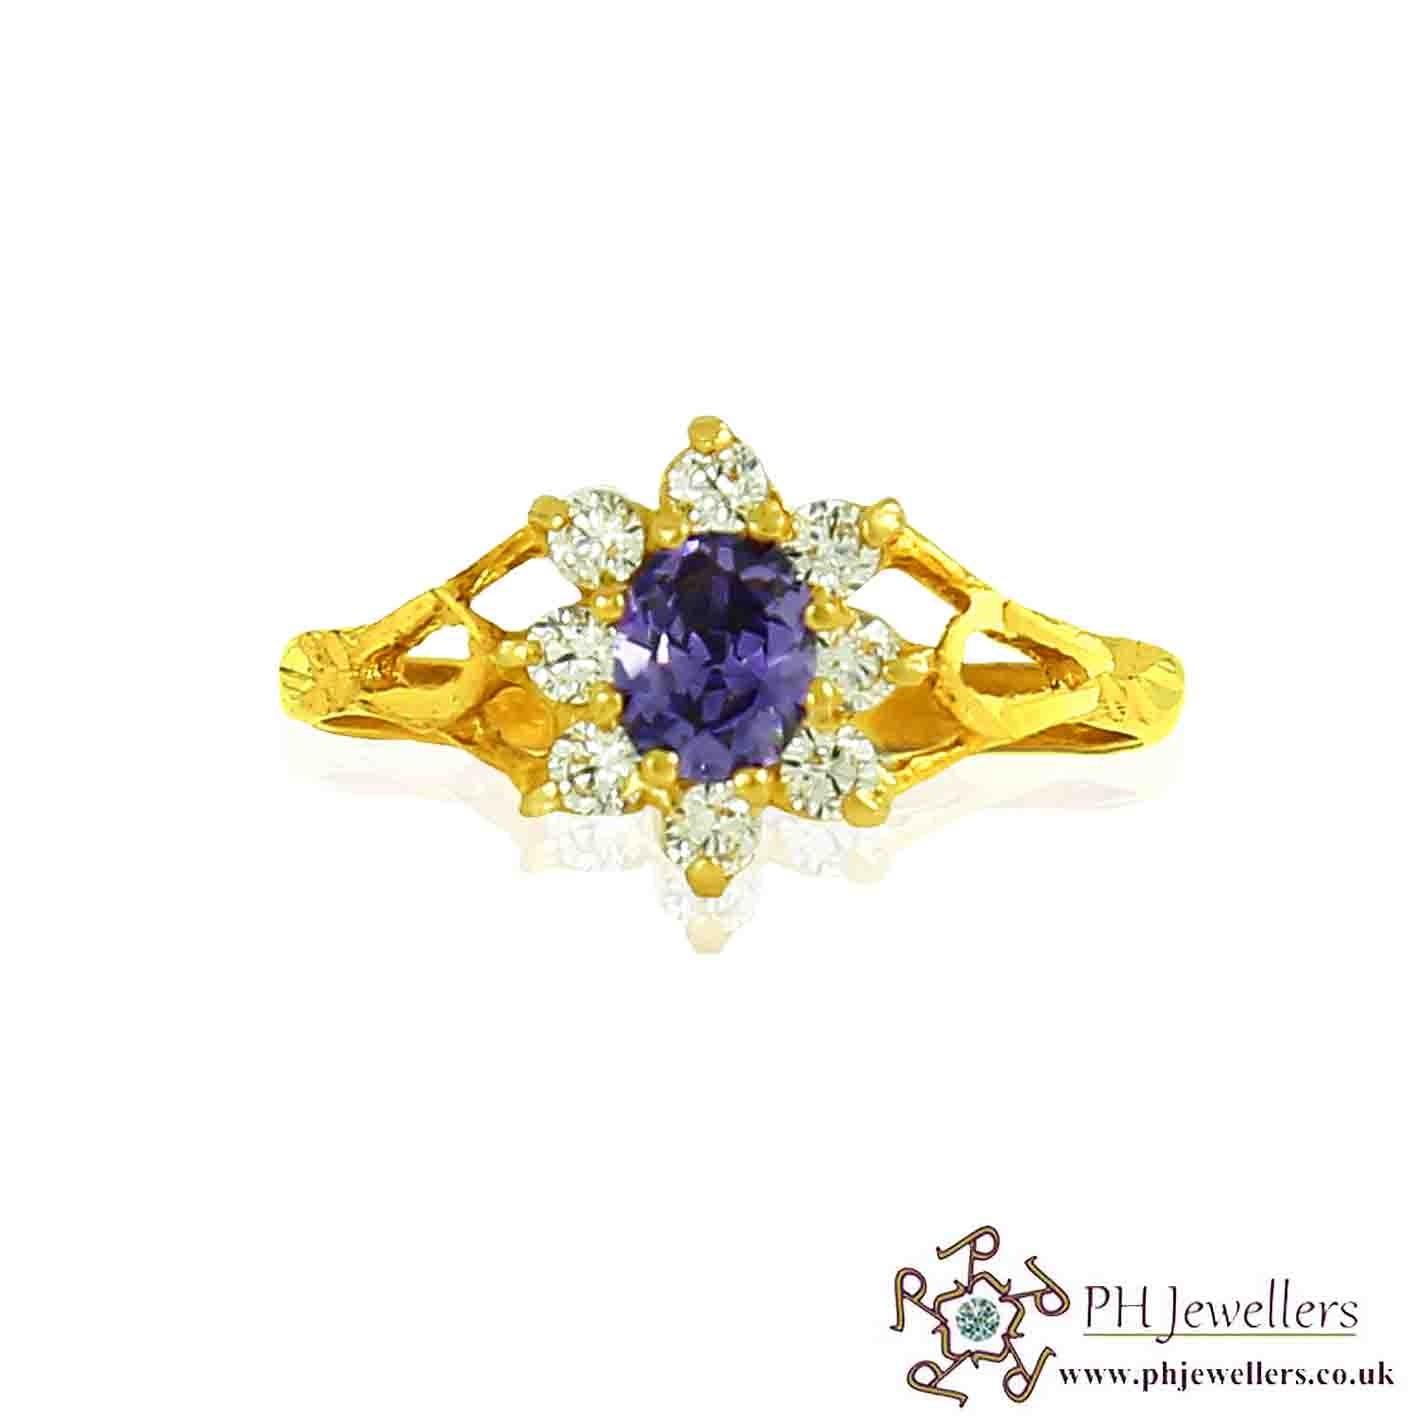 22ct 916 Hallmark Yellow Gold Amythayest Size L1/2,M Ring CZ SR86